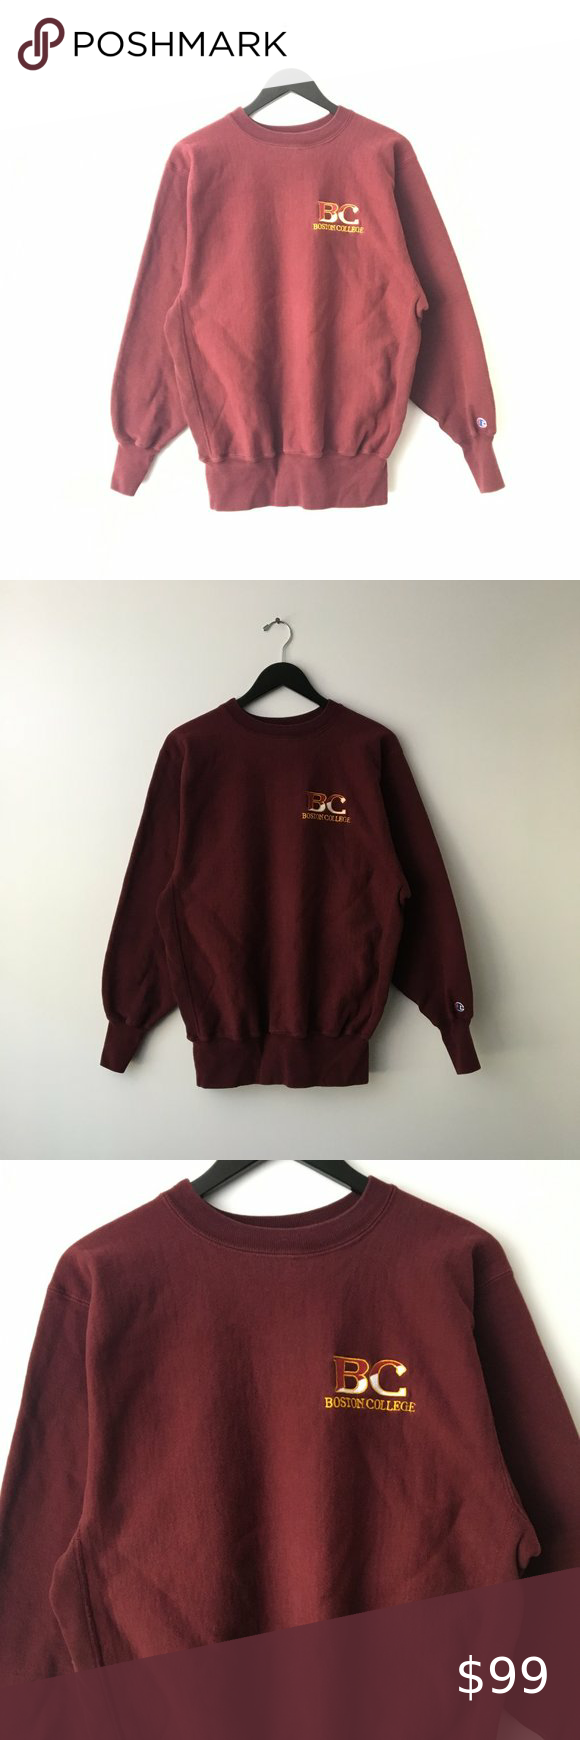 90s Champion Reverse Weave Boston Sweatshirt Xl Champion Reverse Weave Sweatshirts Sweaters Crewneck [ 1740 x 580 Pixel ]